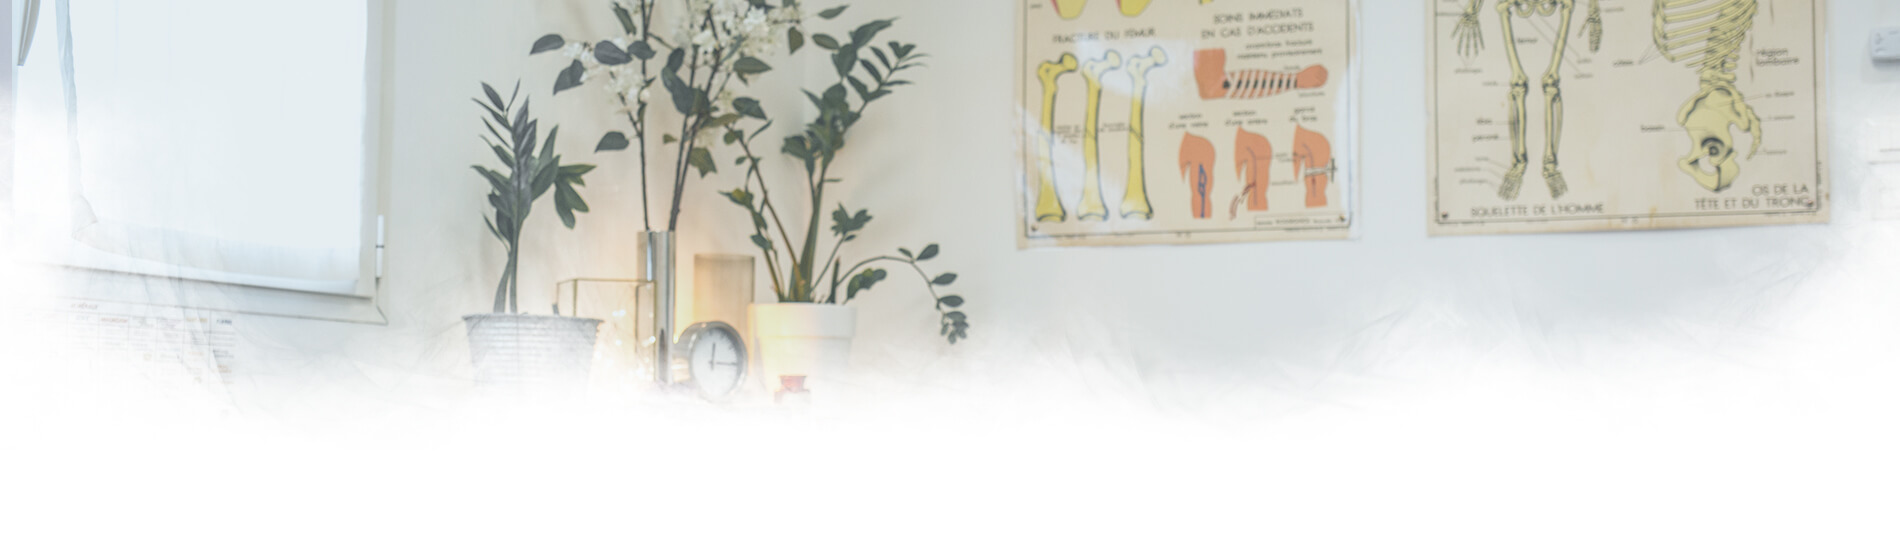 Margaux Vidal - Ostéopathe - Tarifs et Remboursements Header